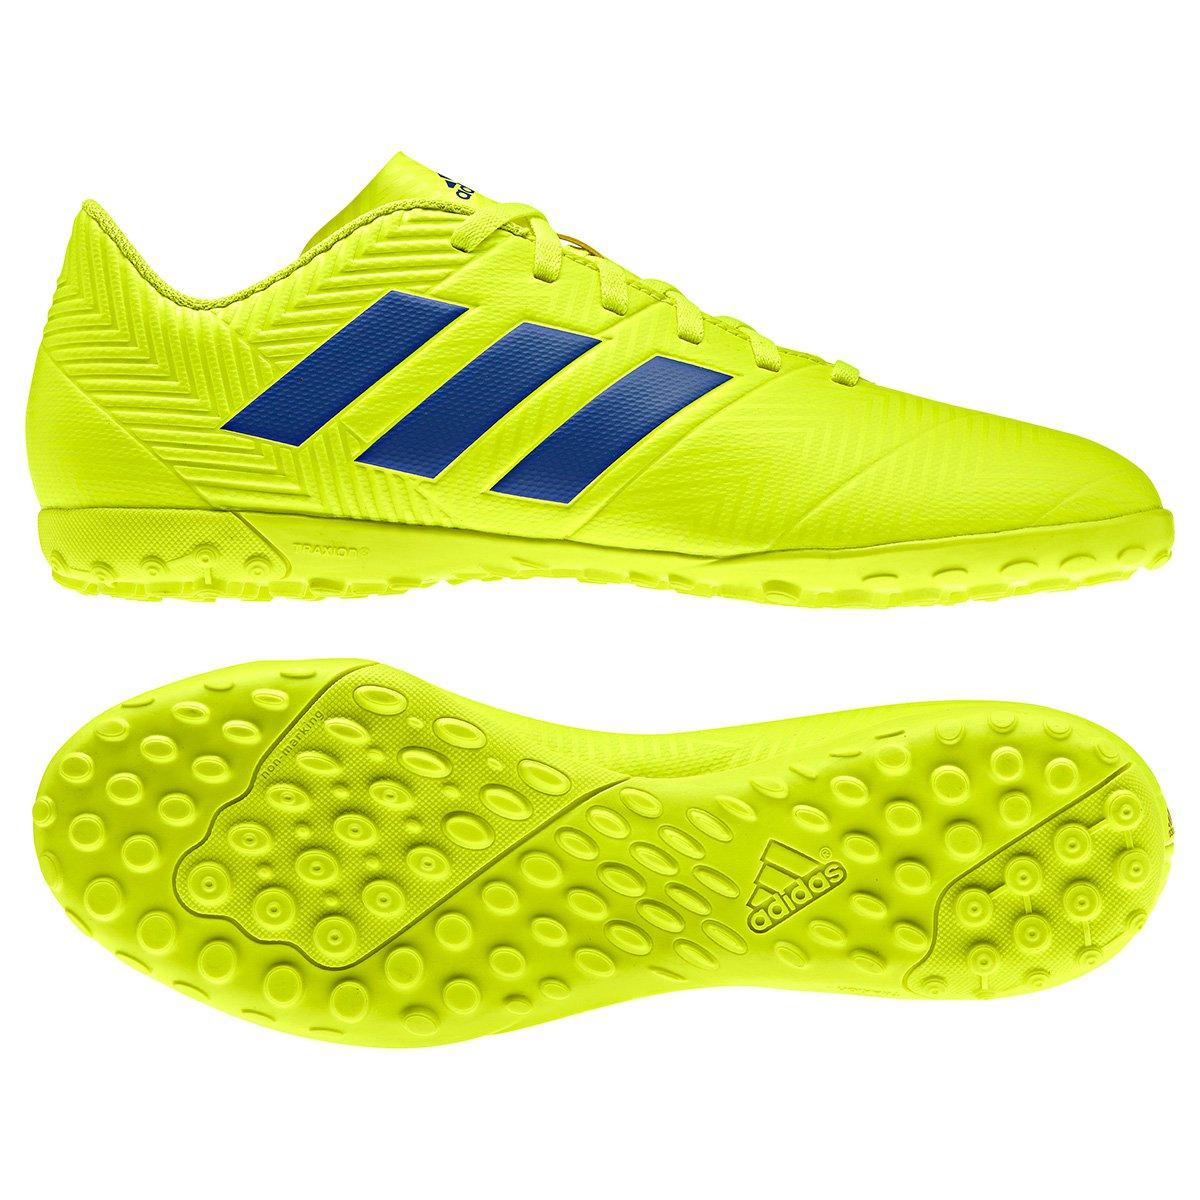 FornecedorNetshoes. Chuteira Society Adidas Nemeziz 18 4 TF 7fa13020dc025